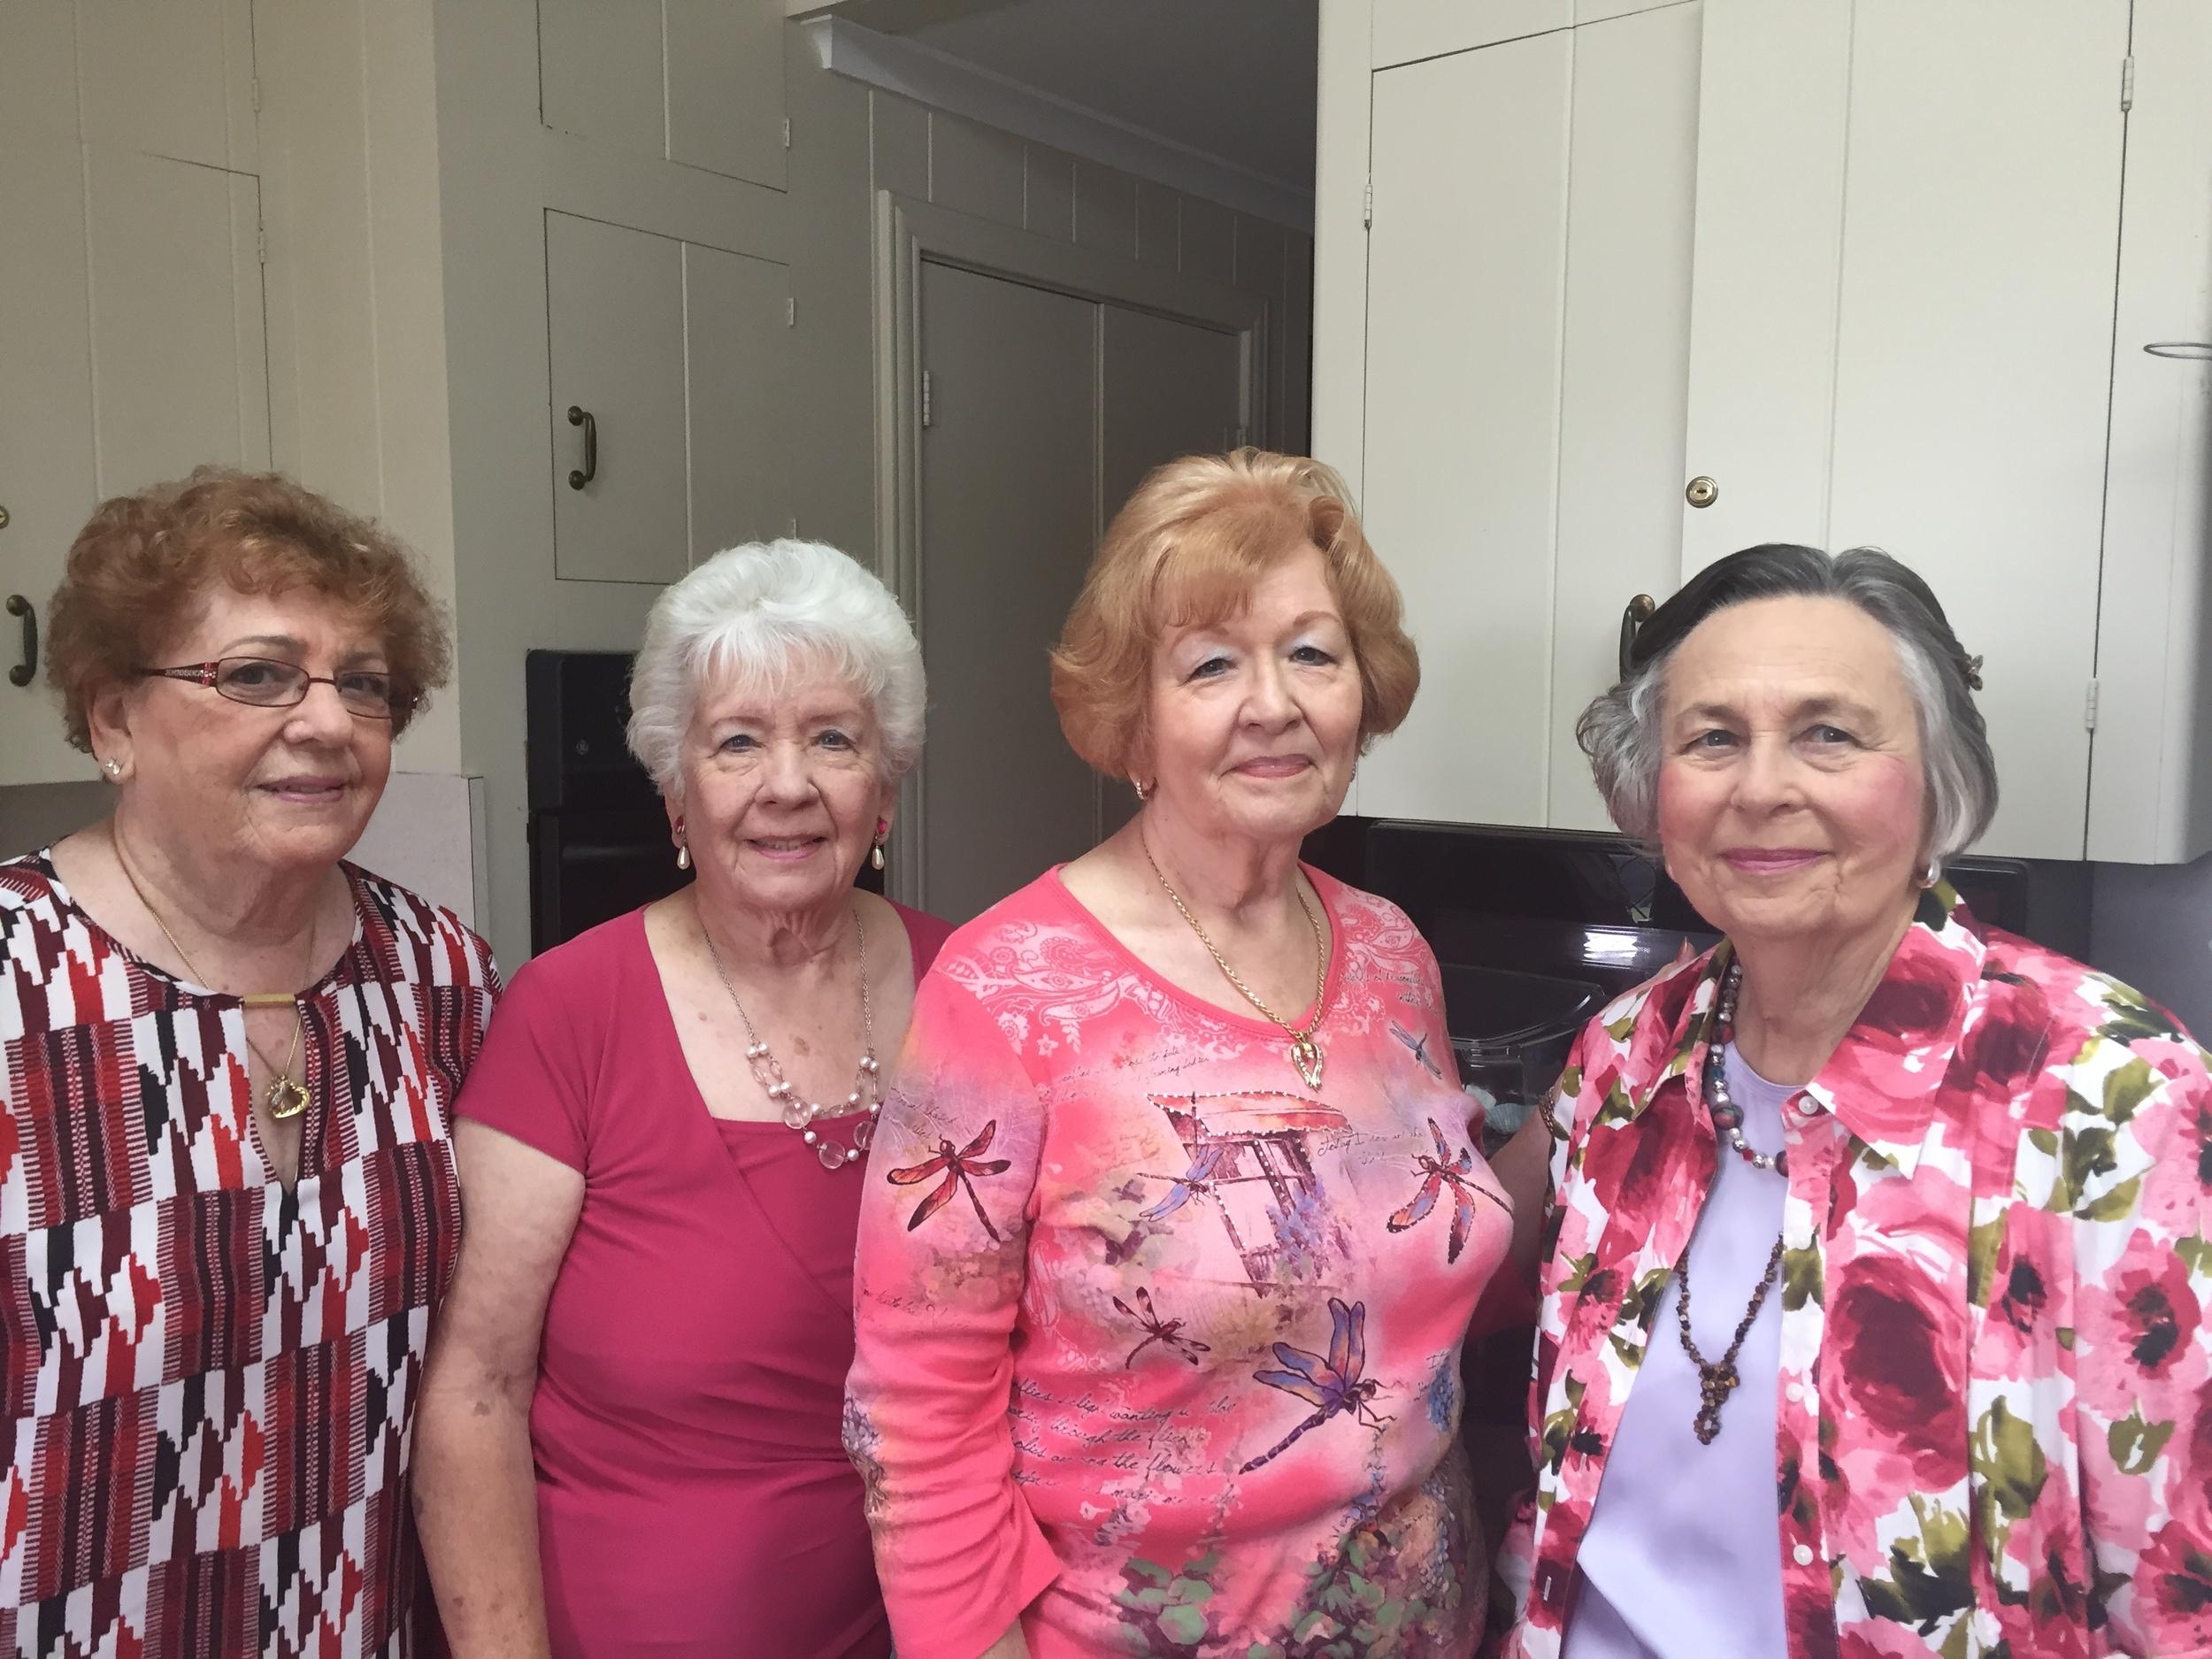 Charleen Jones, Merlene Schumacher, Freda Martin and Joan Zeiss - Hostesses